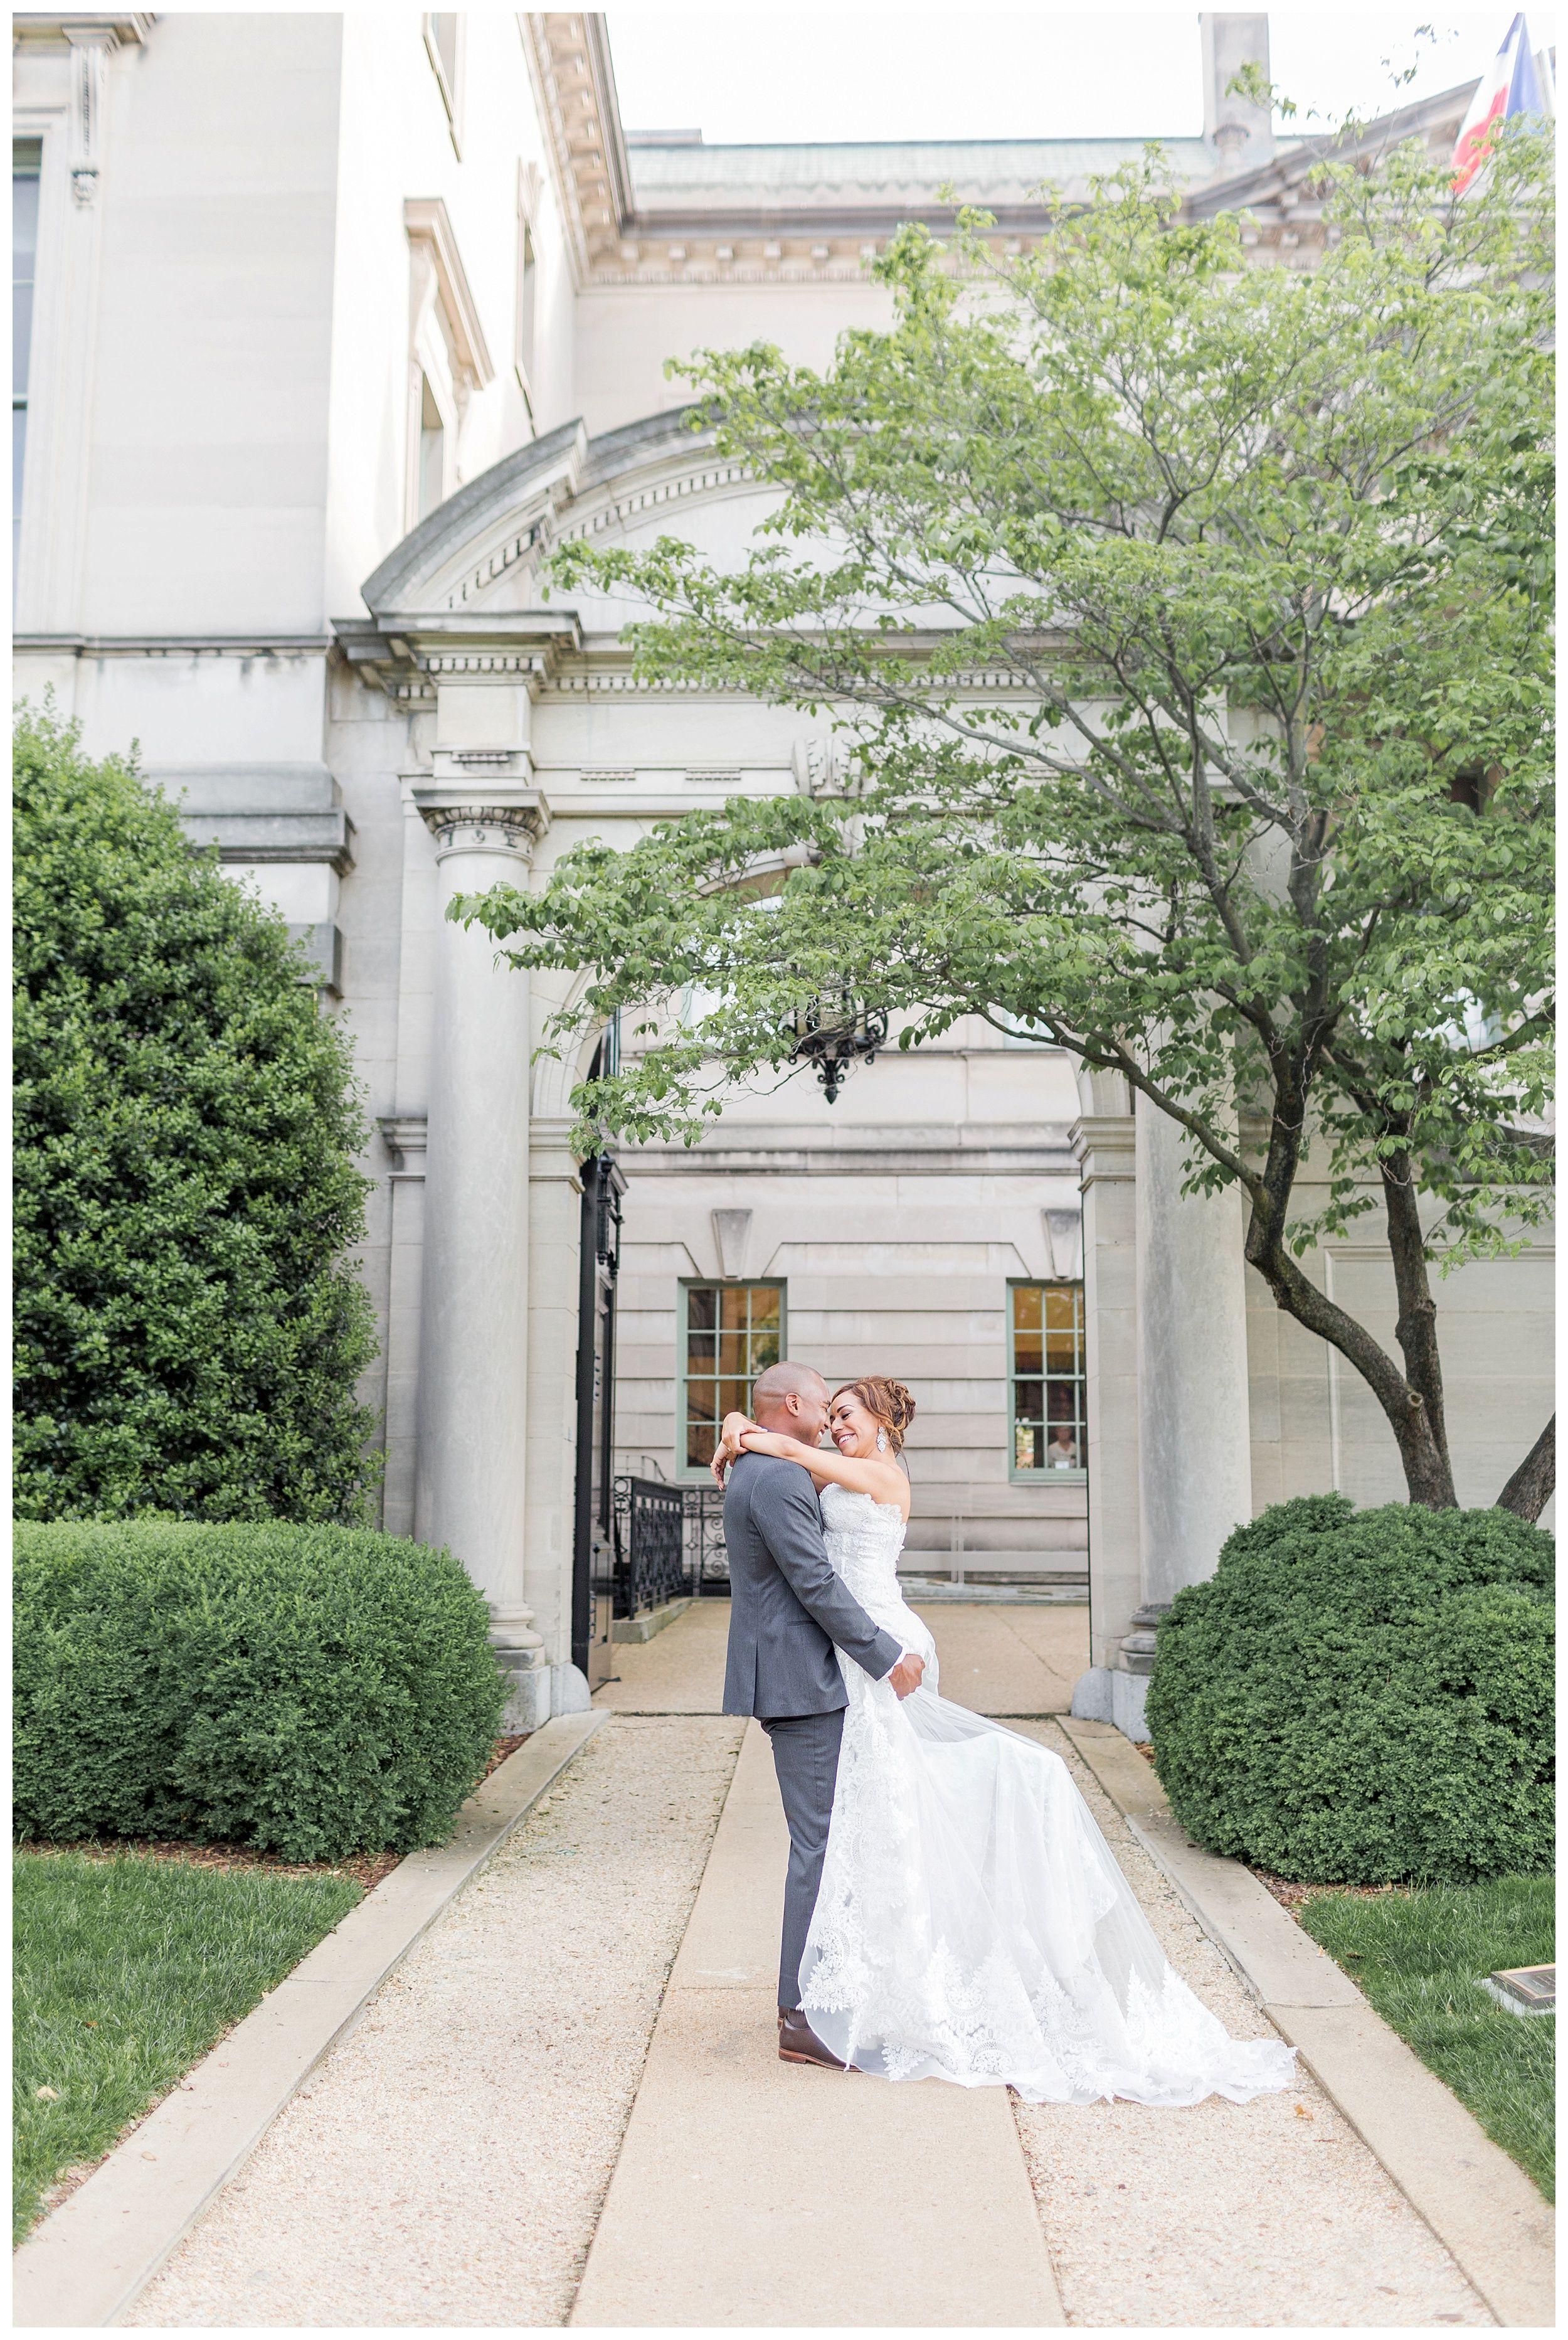 Anderson house wedding dc weddings dc wedding venues